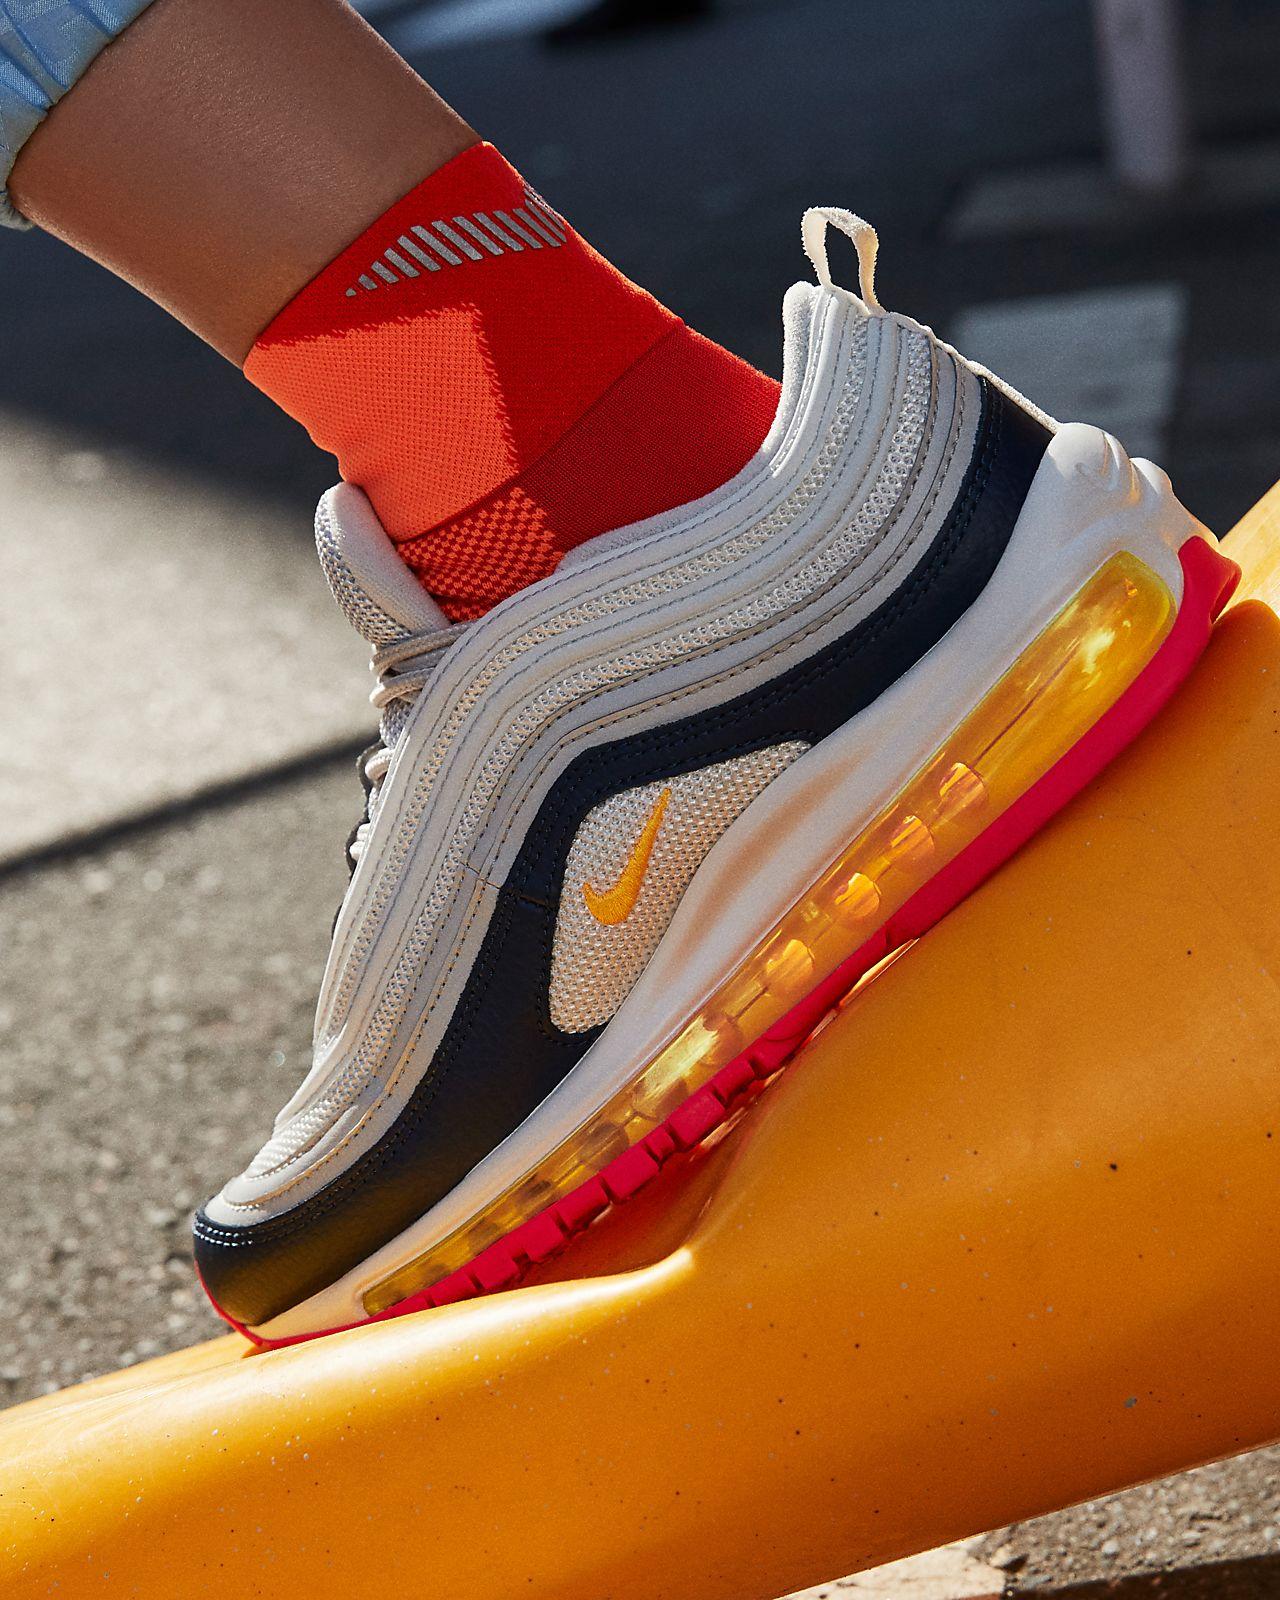 promo code 53ba4 04830 ... Nike Air Max 97 Premium Women s Shoe